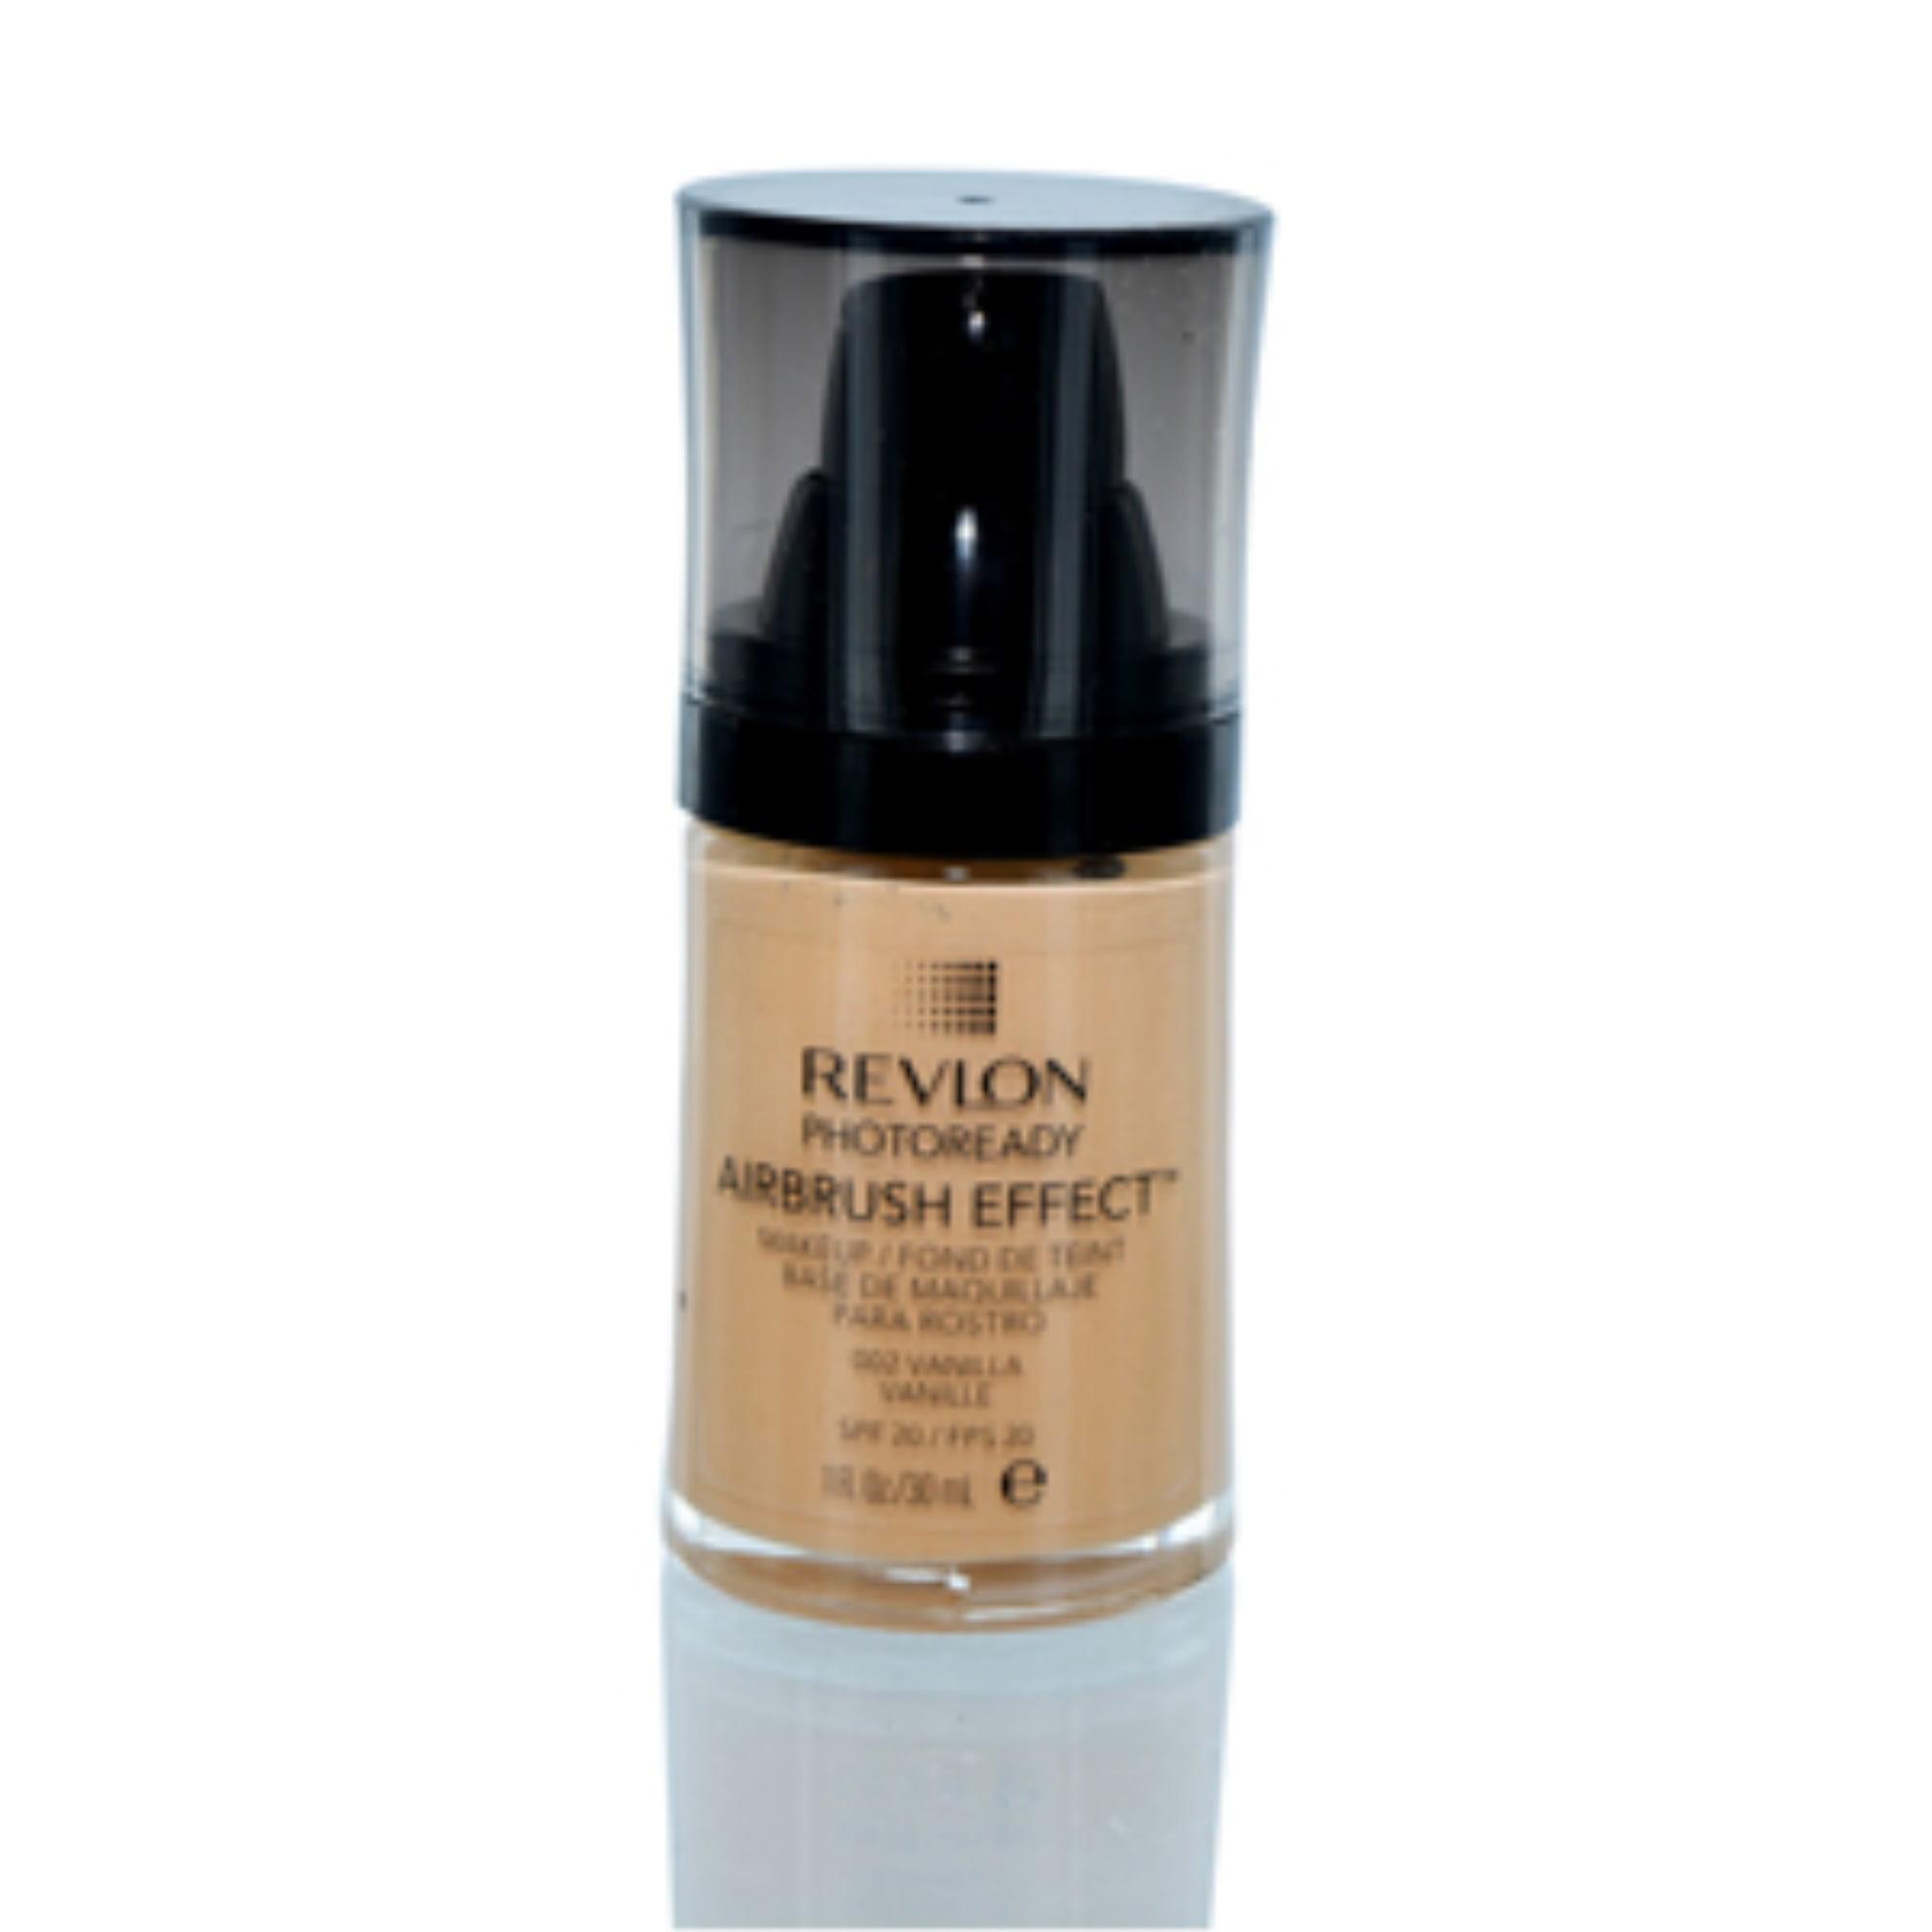 Revlon Photoready Airbrush Effect Foundation SPF20 001